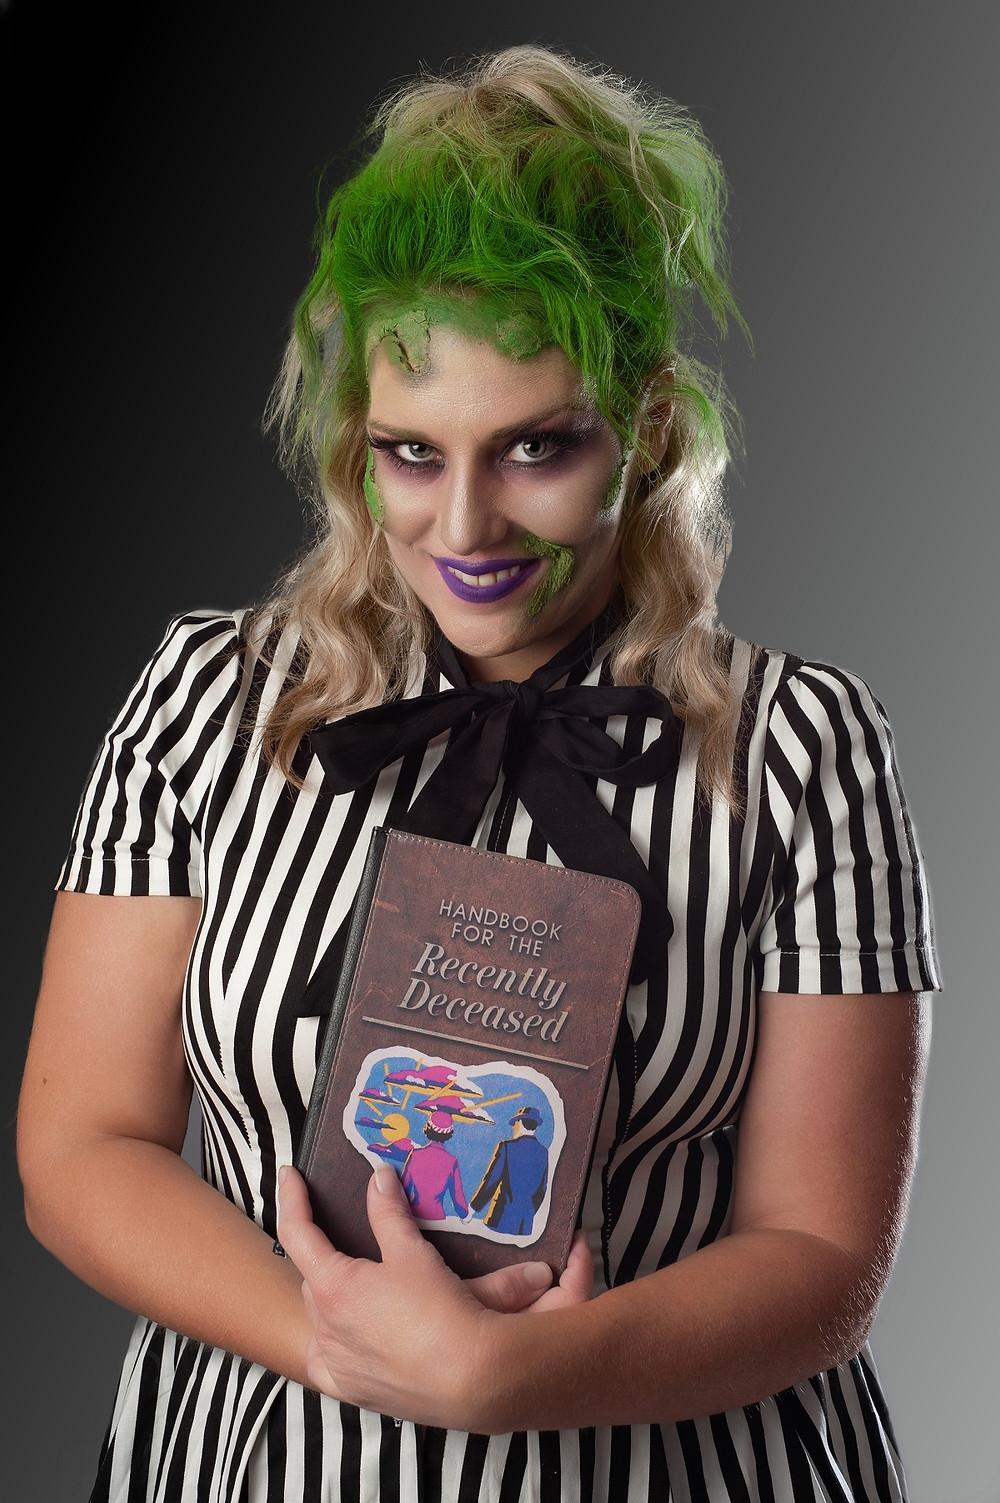 Character portrait of lady Beetlejuice